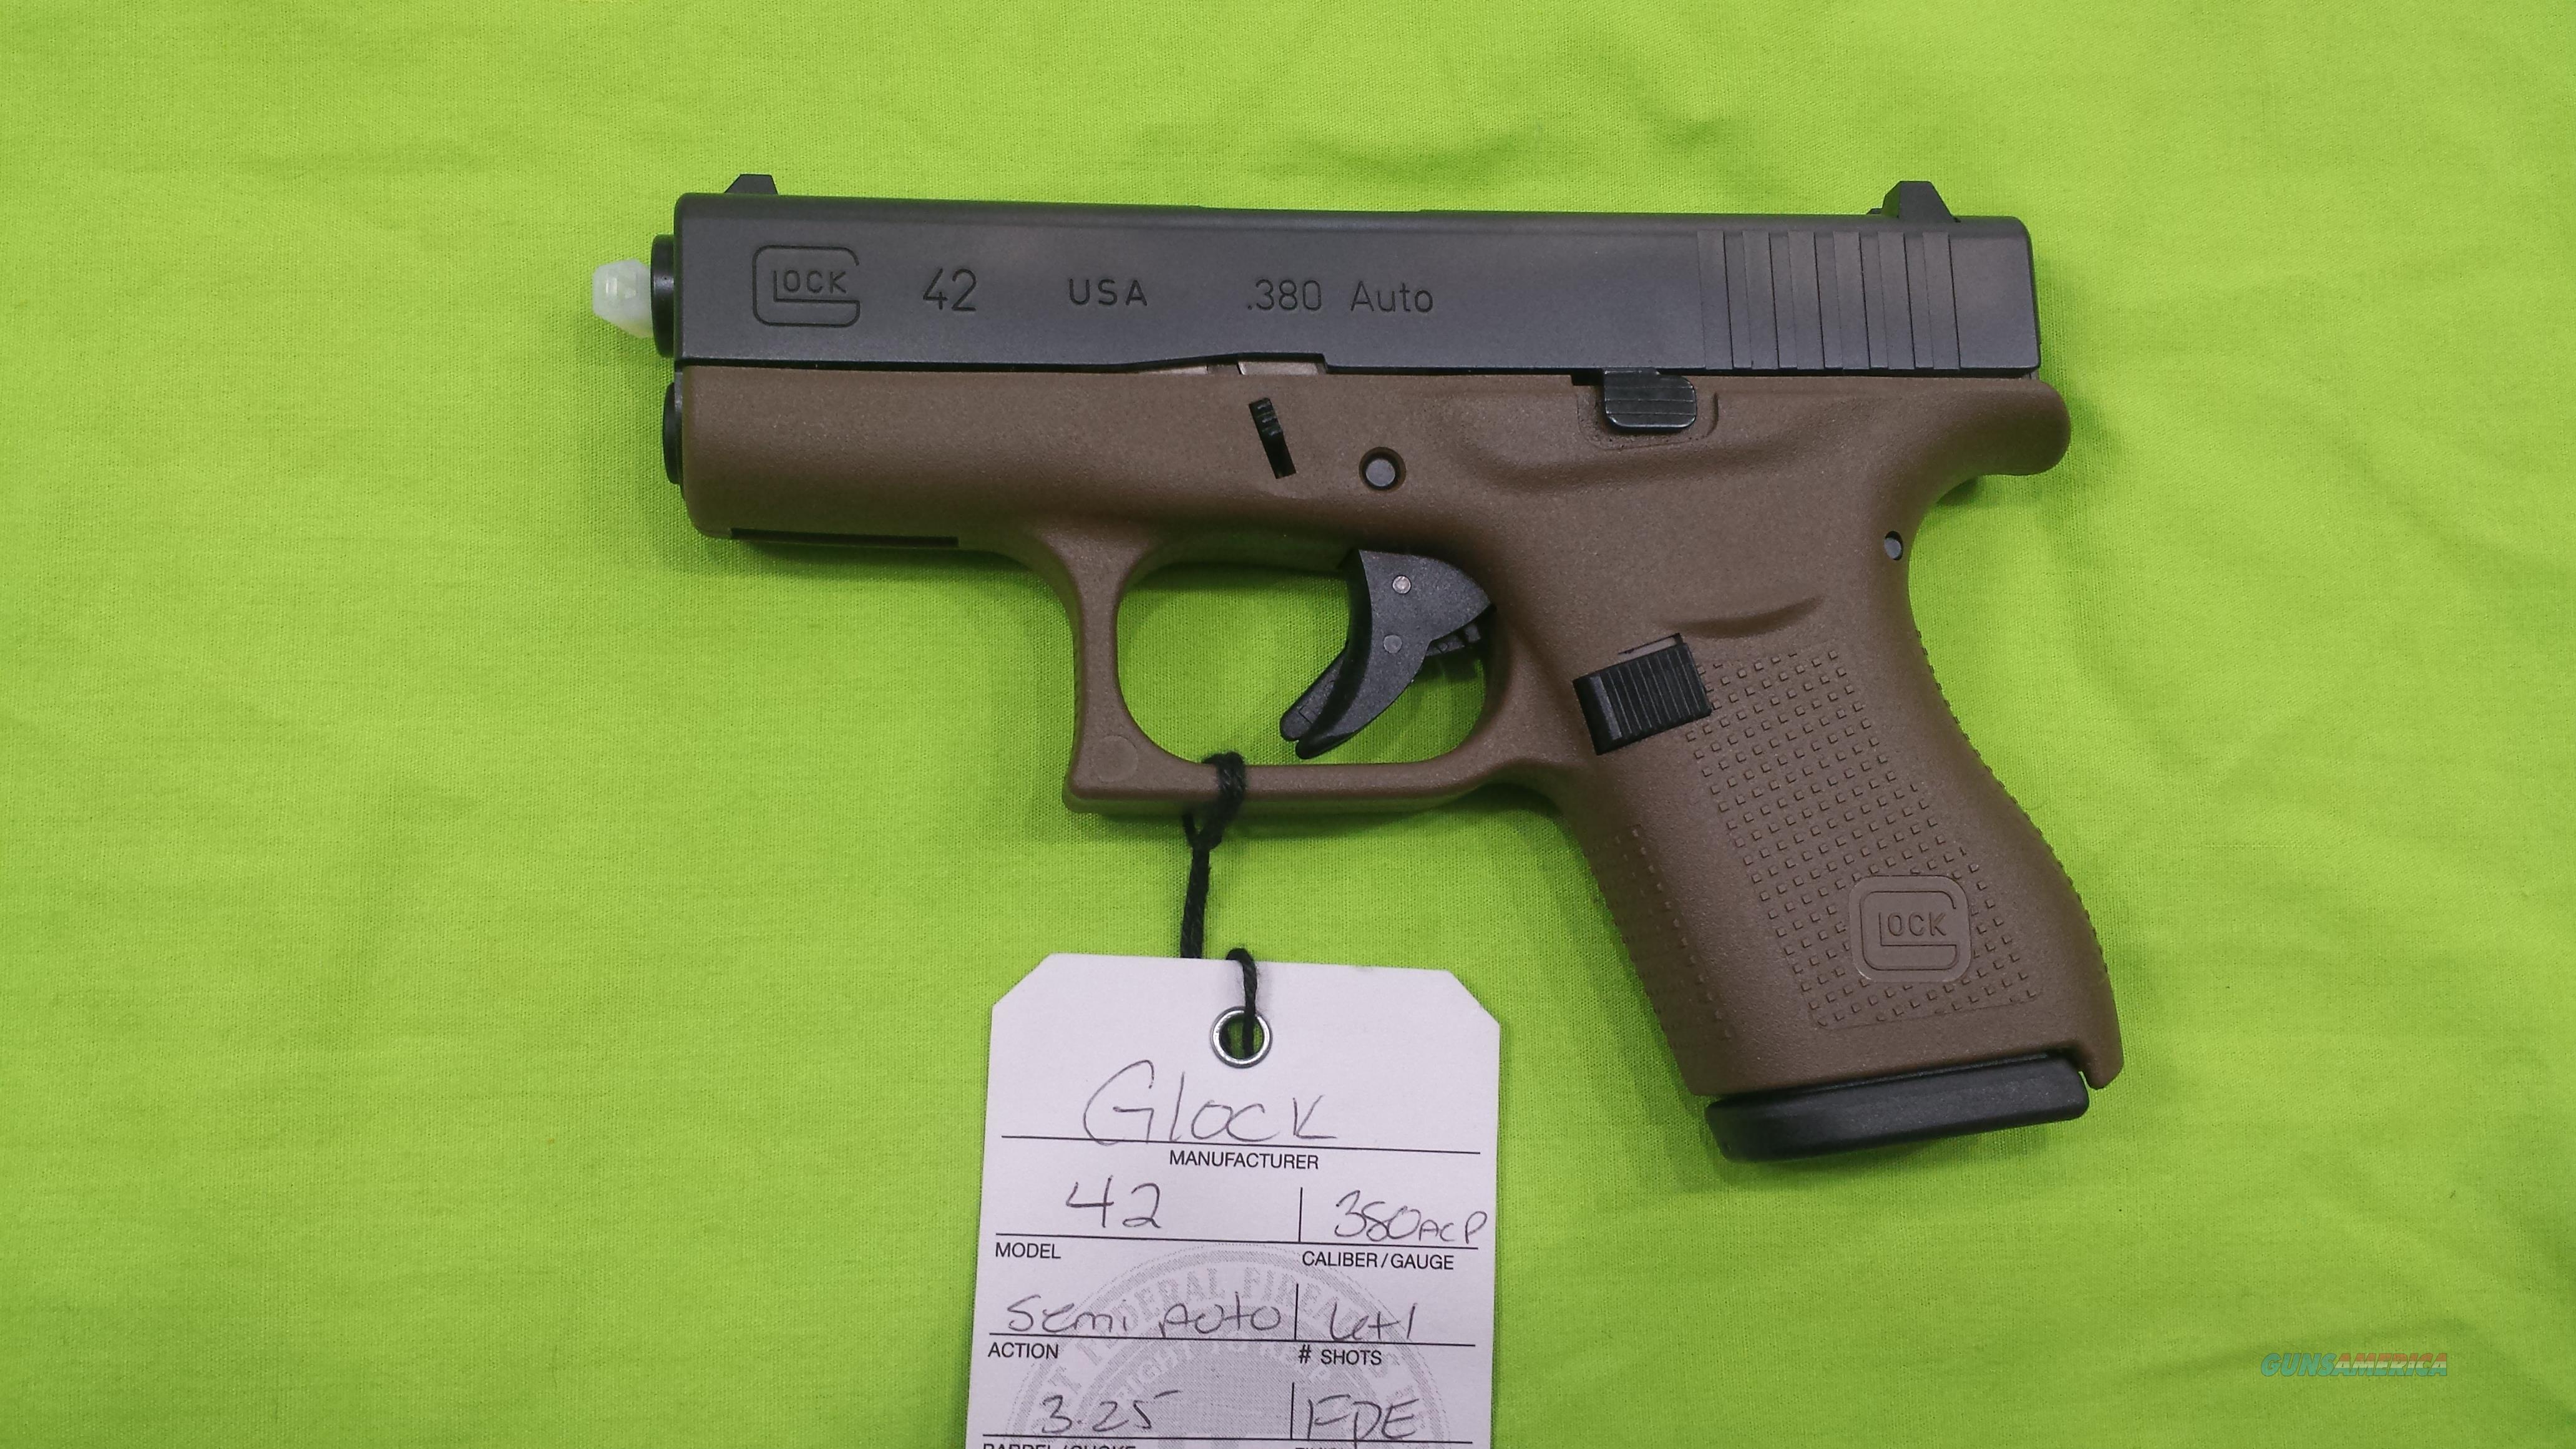 GLOCK 42 .380ACP 380 SUB COMPACT 6RD FDE  Guns > Pistols > Glock Pistols > 42